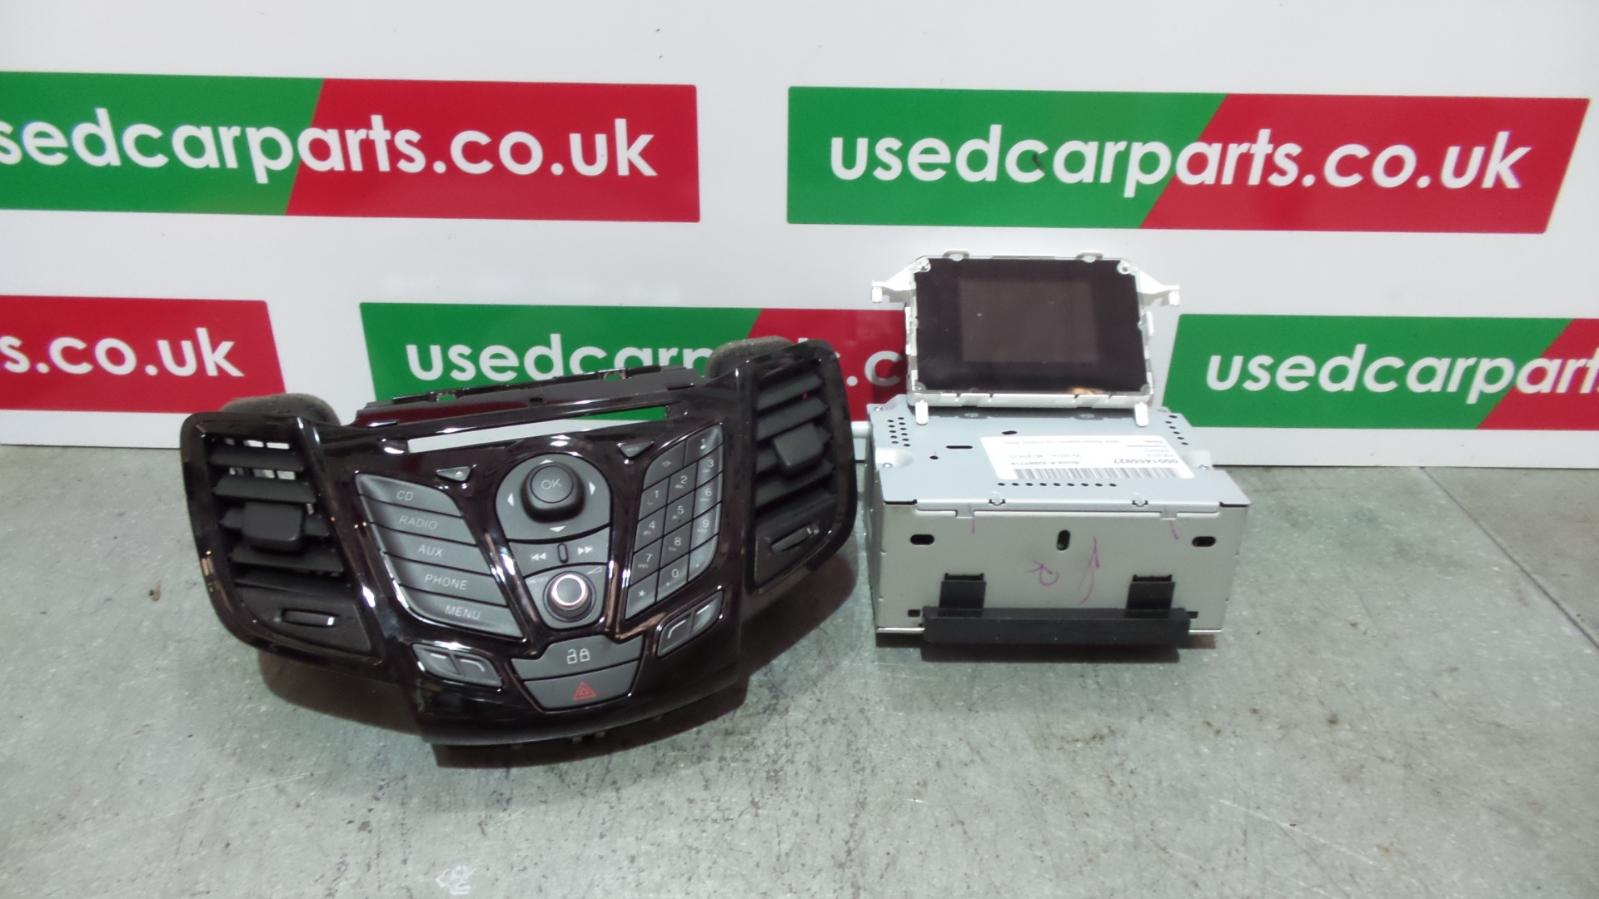 dab vehicle car stereos head units for fiesta 2014 ford fiesta radio mk8 radio stereo cd player ahu dab